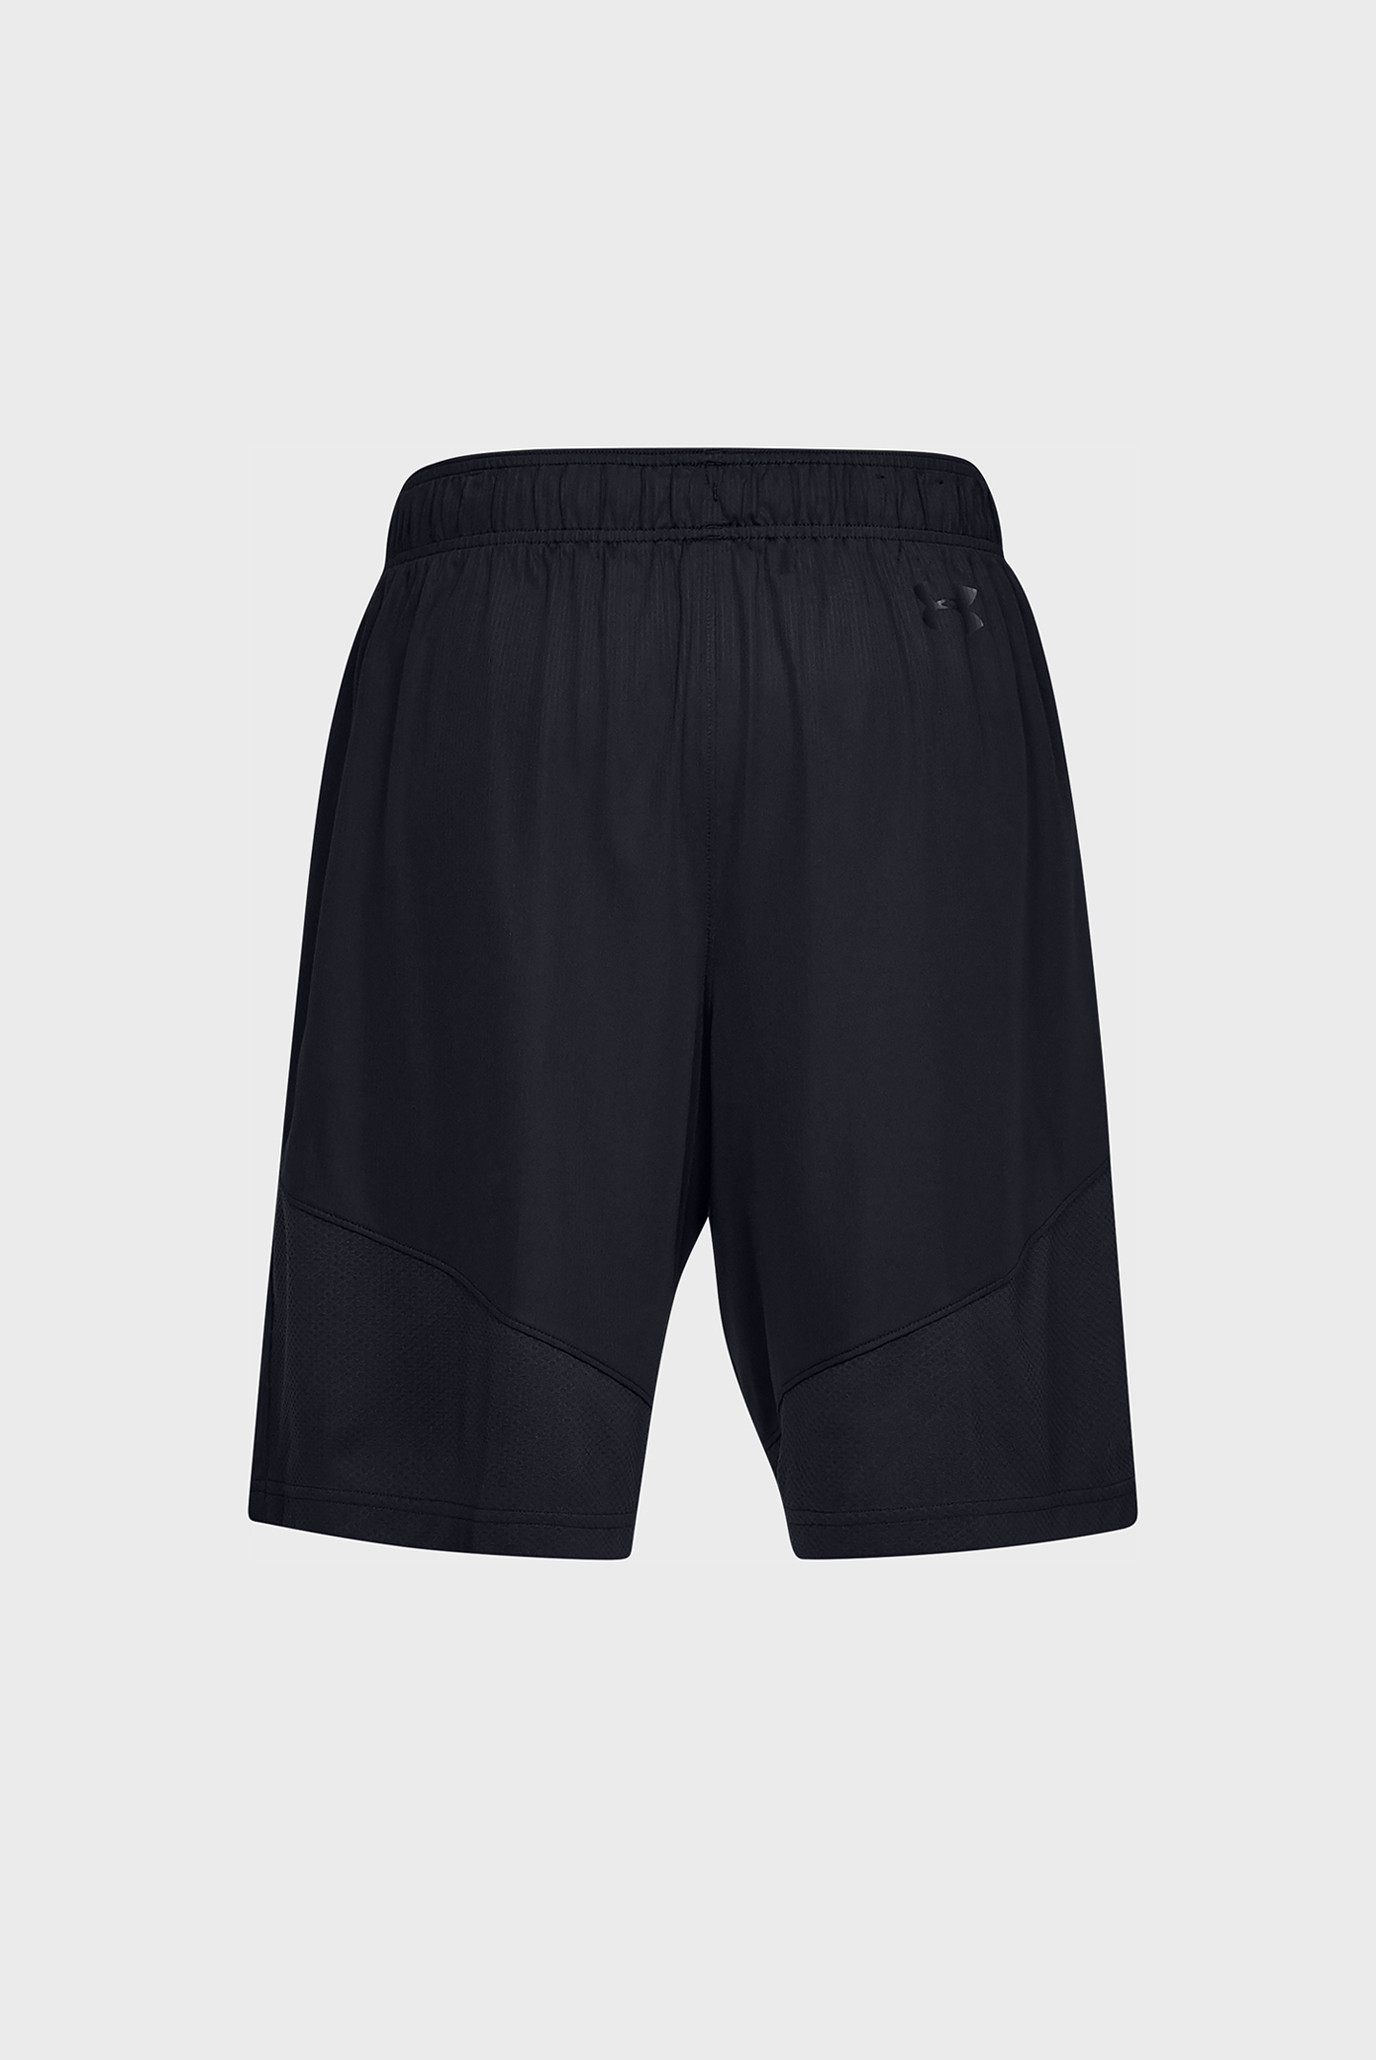 Мужские черные шорты SC30 CORE LOGO 10in Under Armour